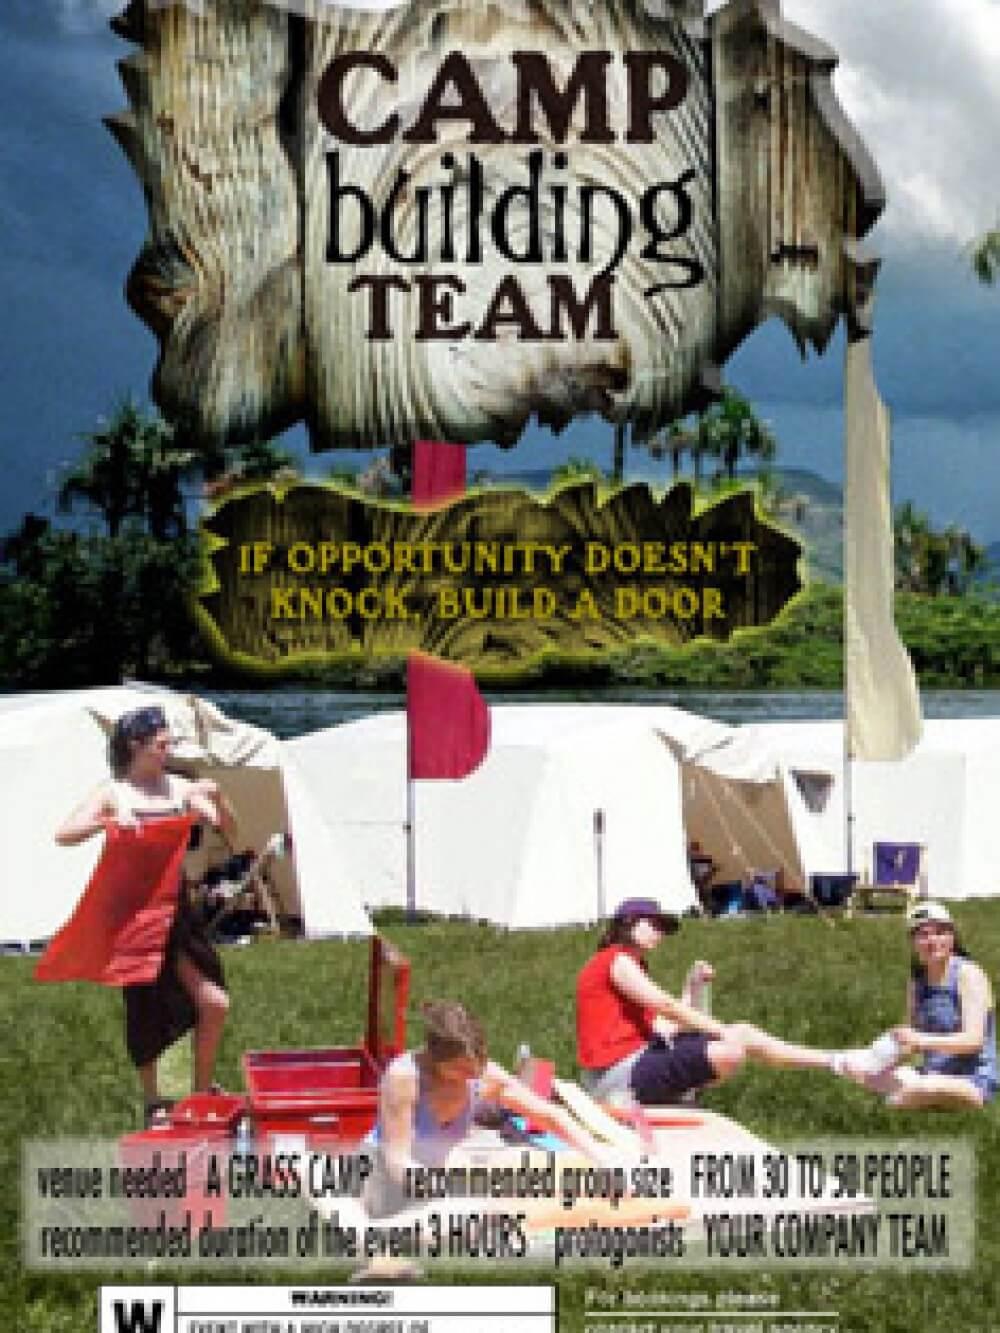 camp_building_team_vertical_web